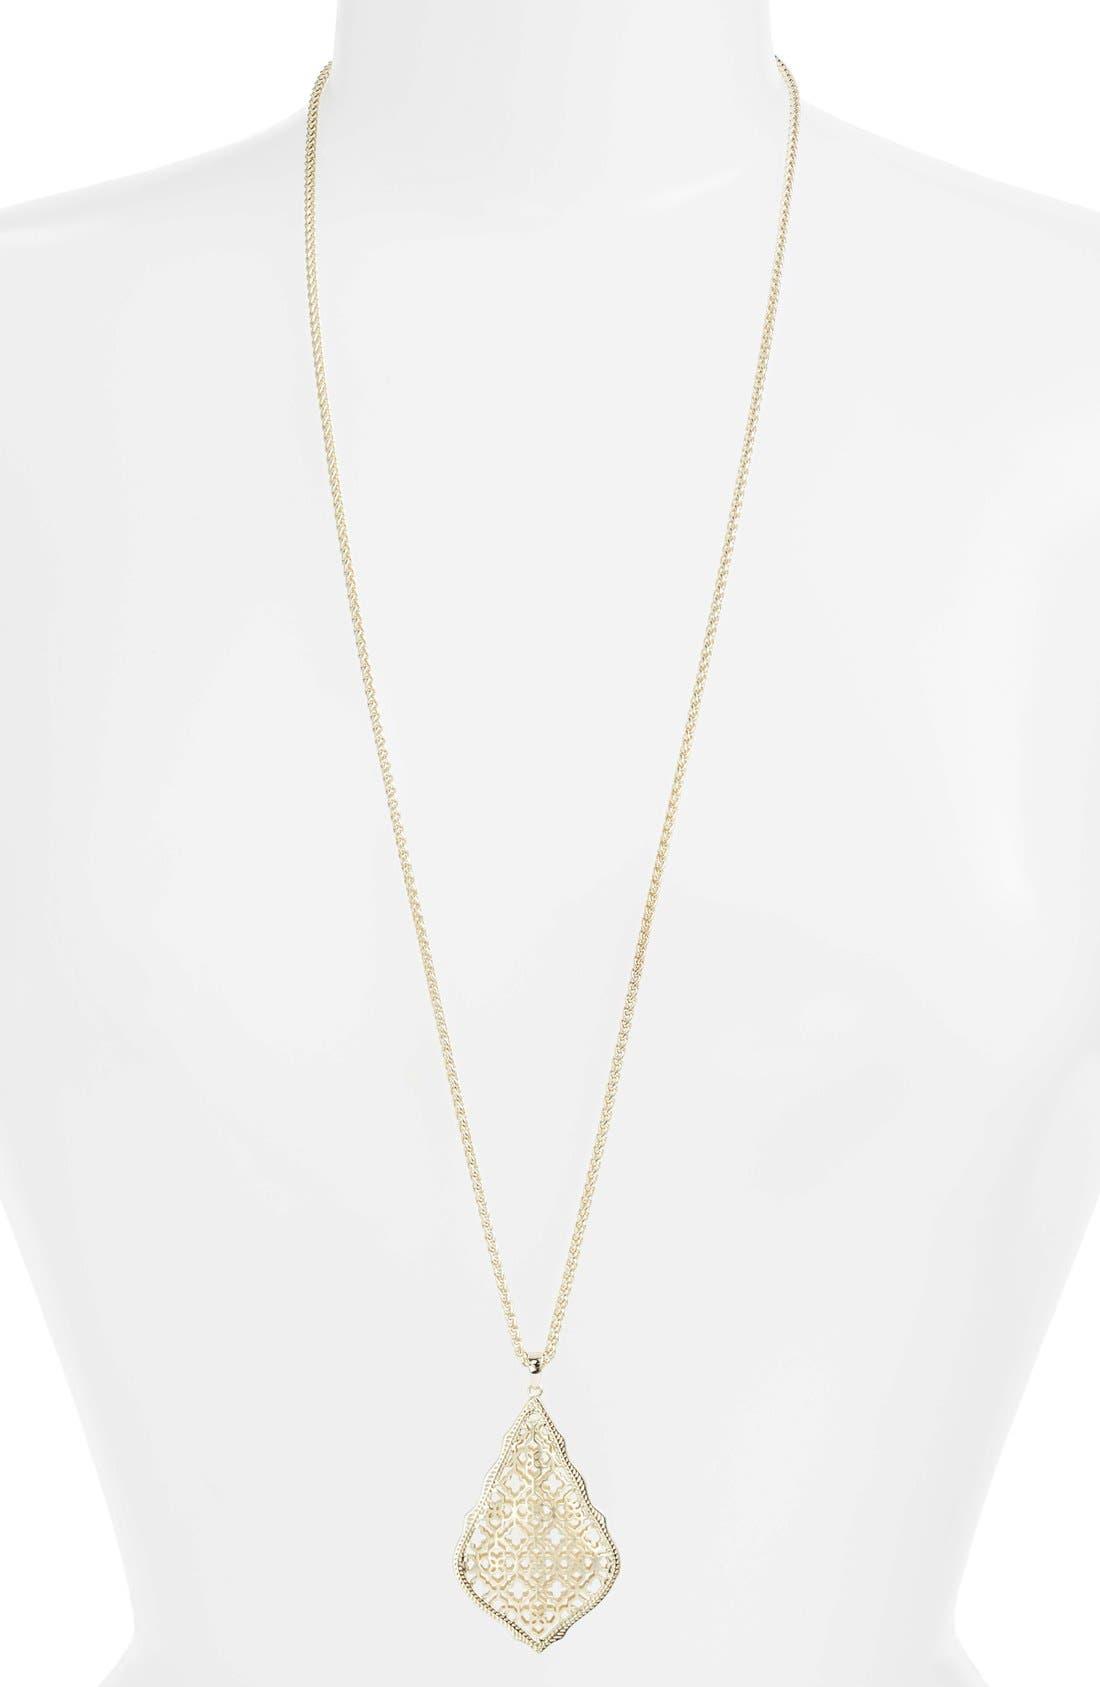 Kendra Scott 'Aiden' Pendant Necklace